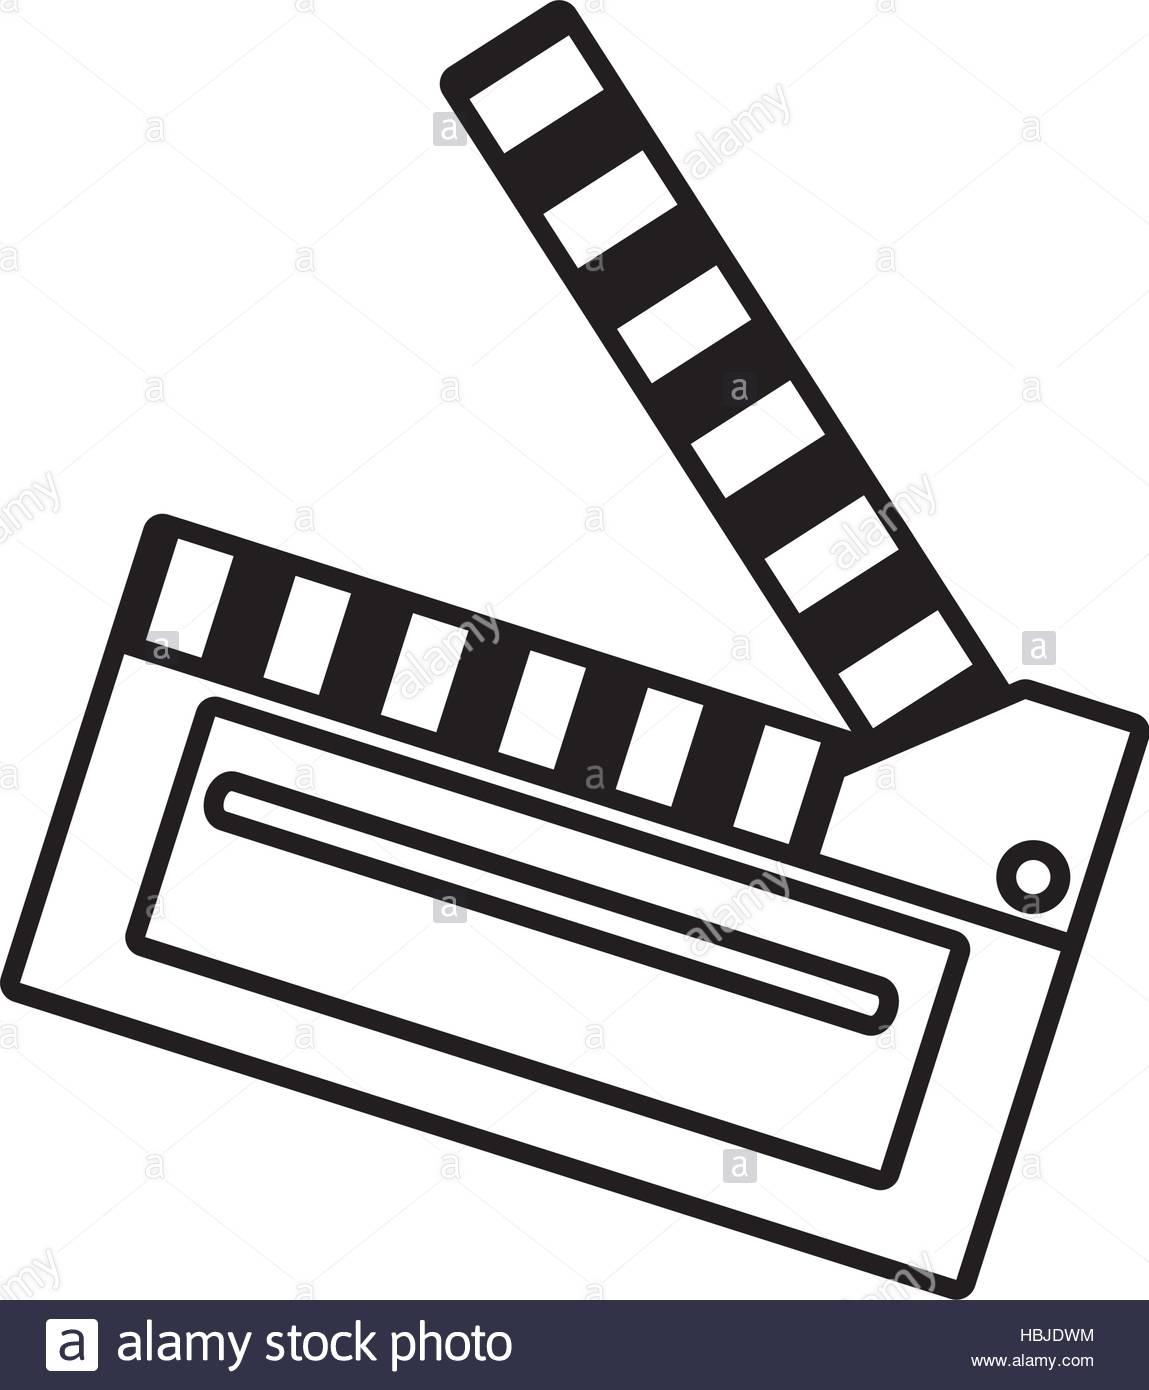 1149x1390 Film Clapper Chalkboard Scene Icon Outline Vector Illustration Eps